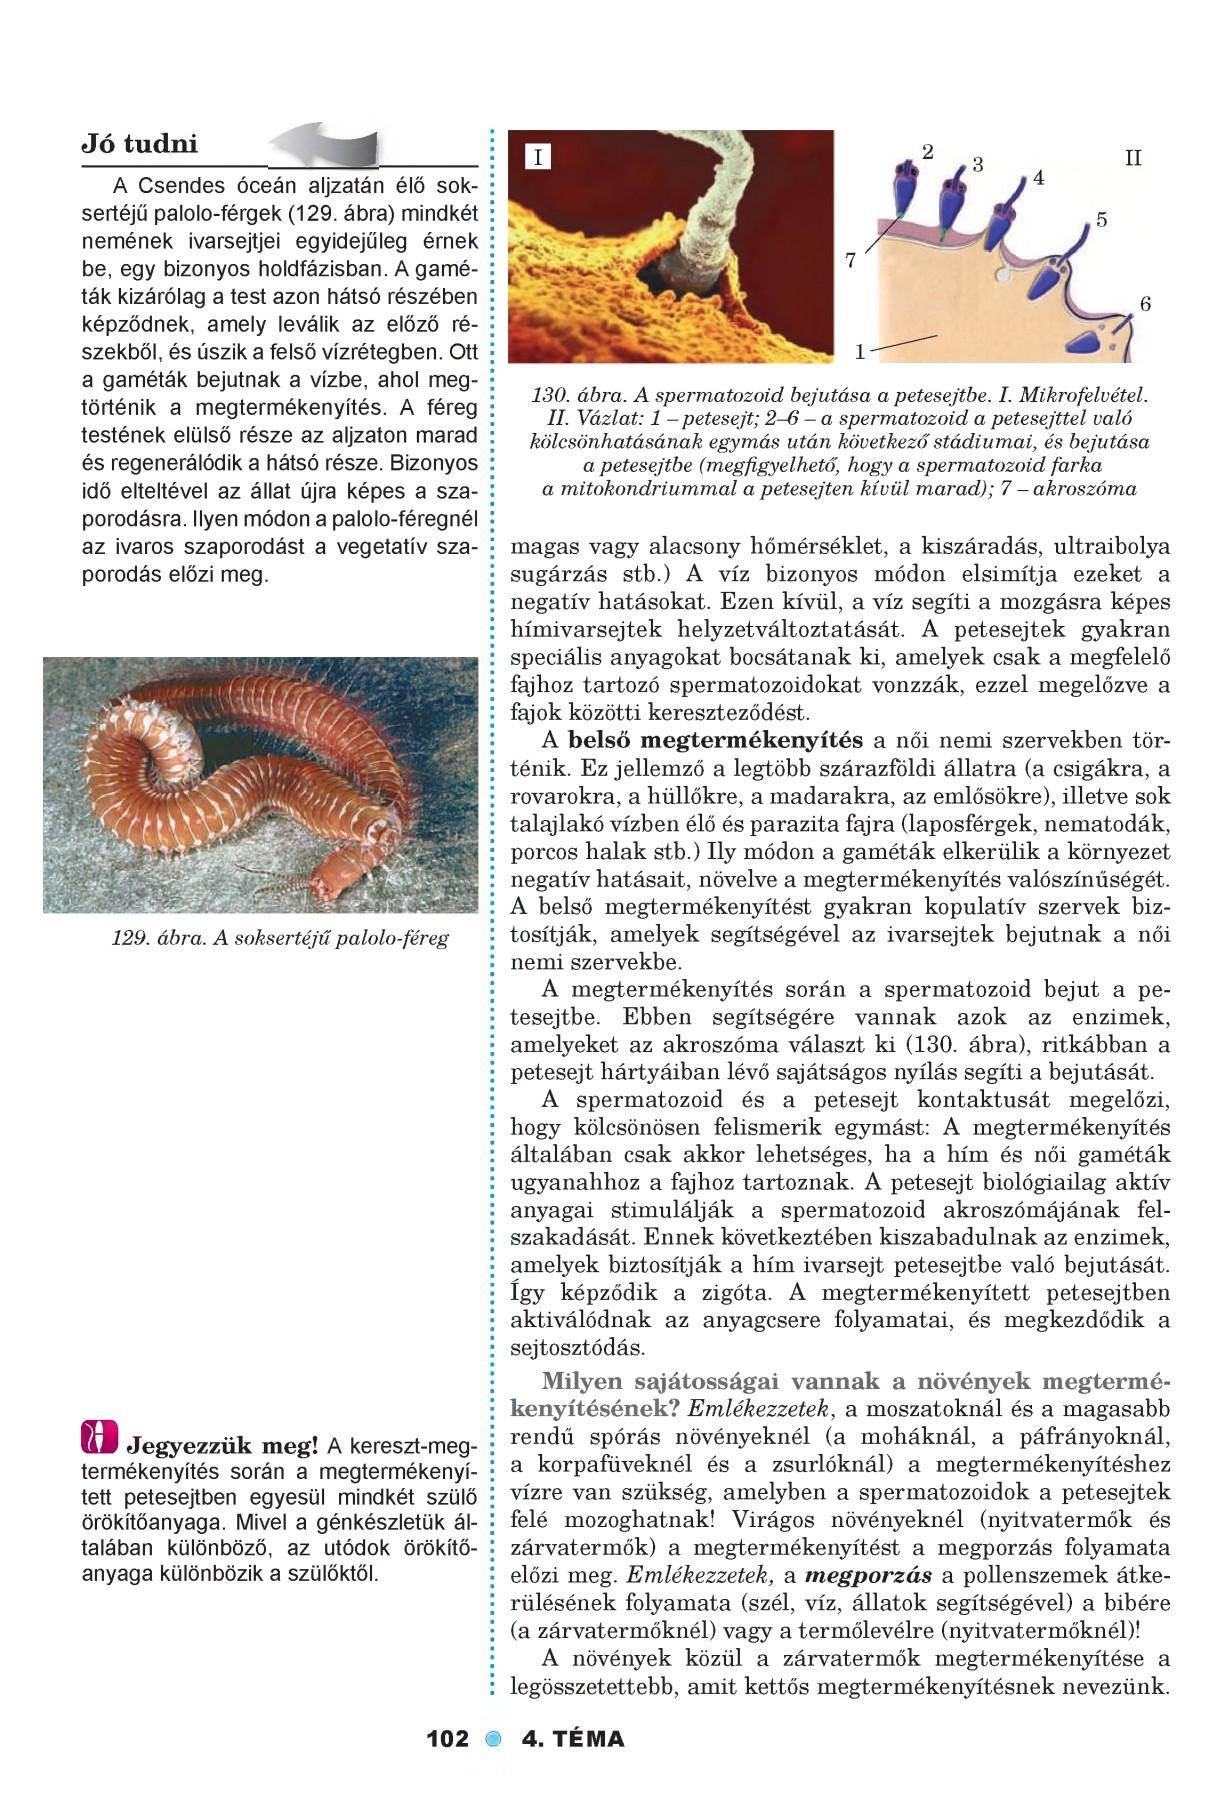 petesejtek paraziták tünetei